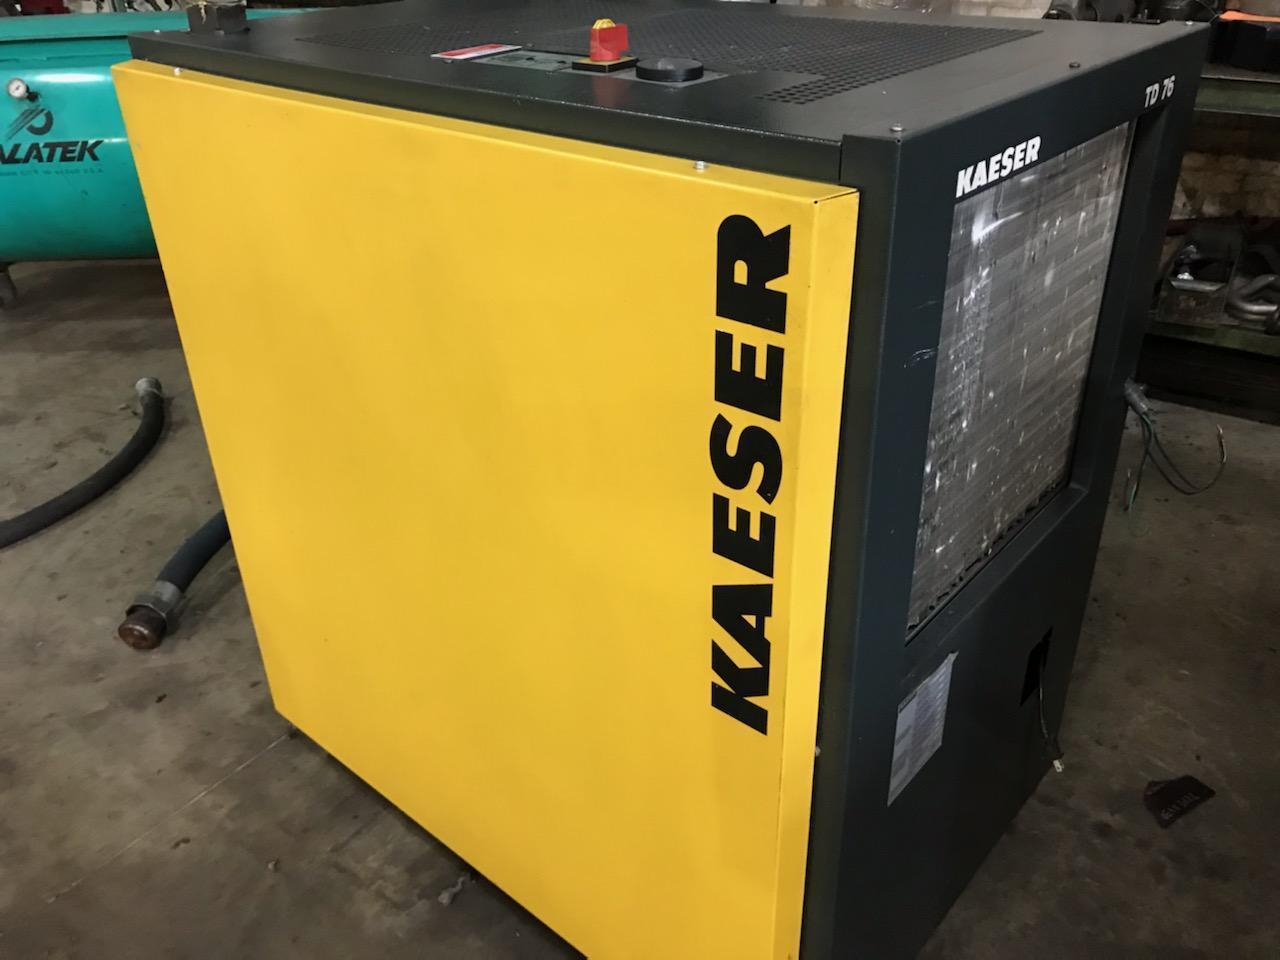 Kaeser 285 scfm Cycling Refrigerated air Dryer